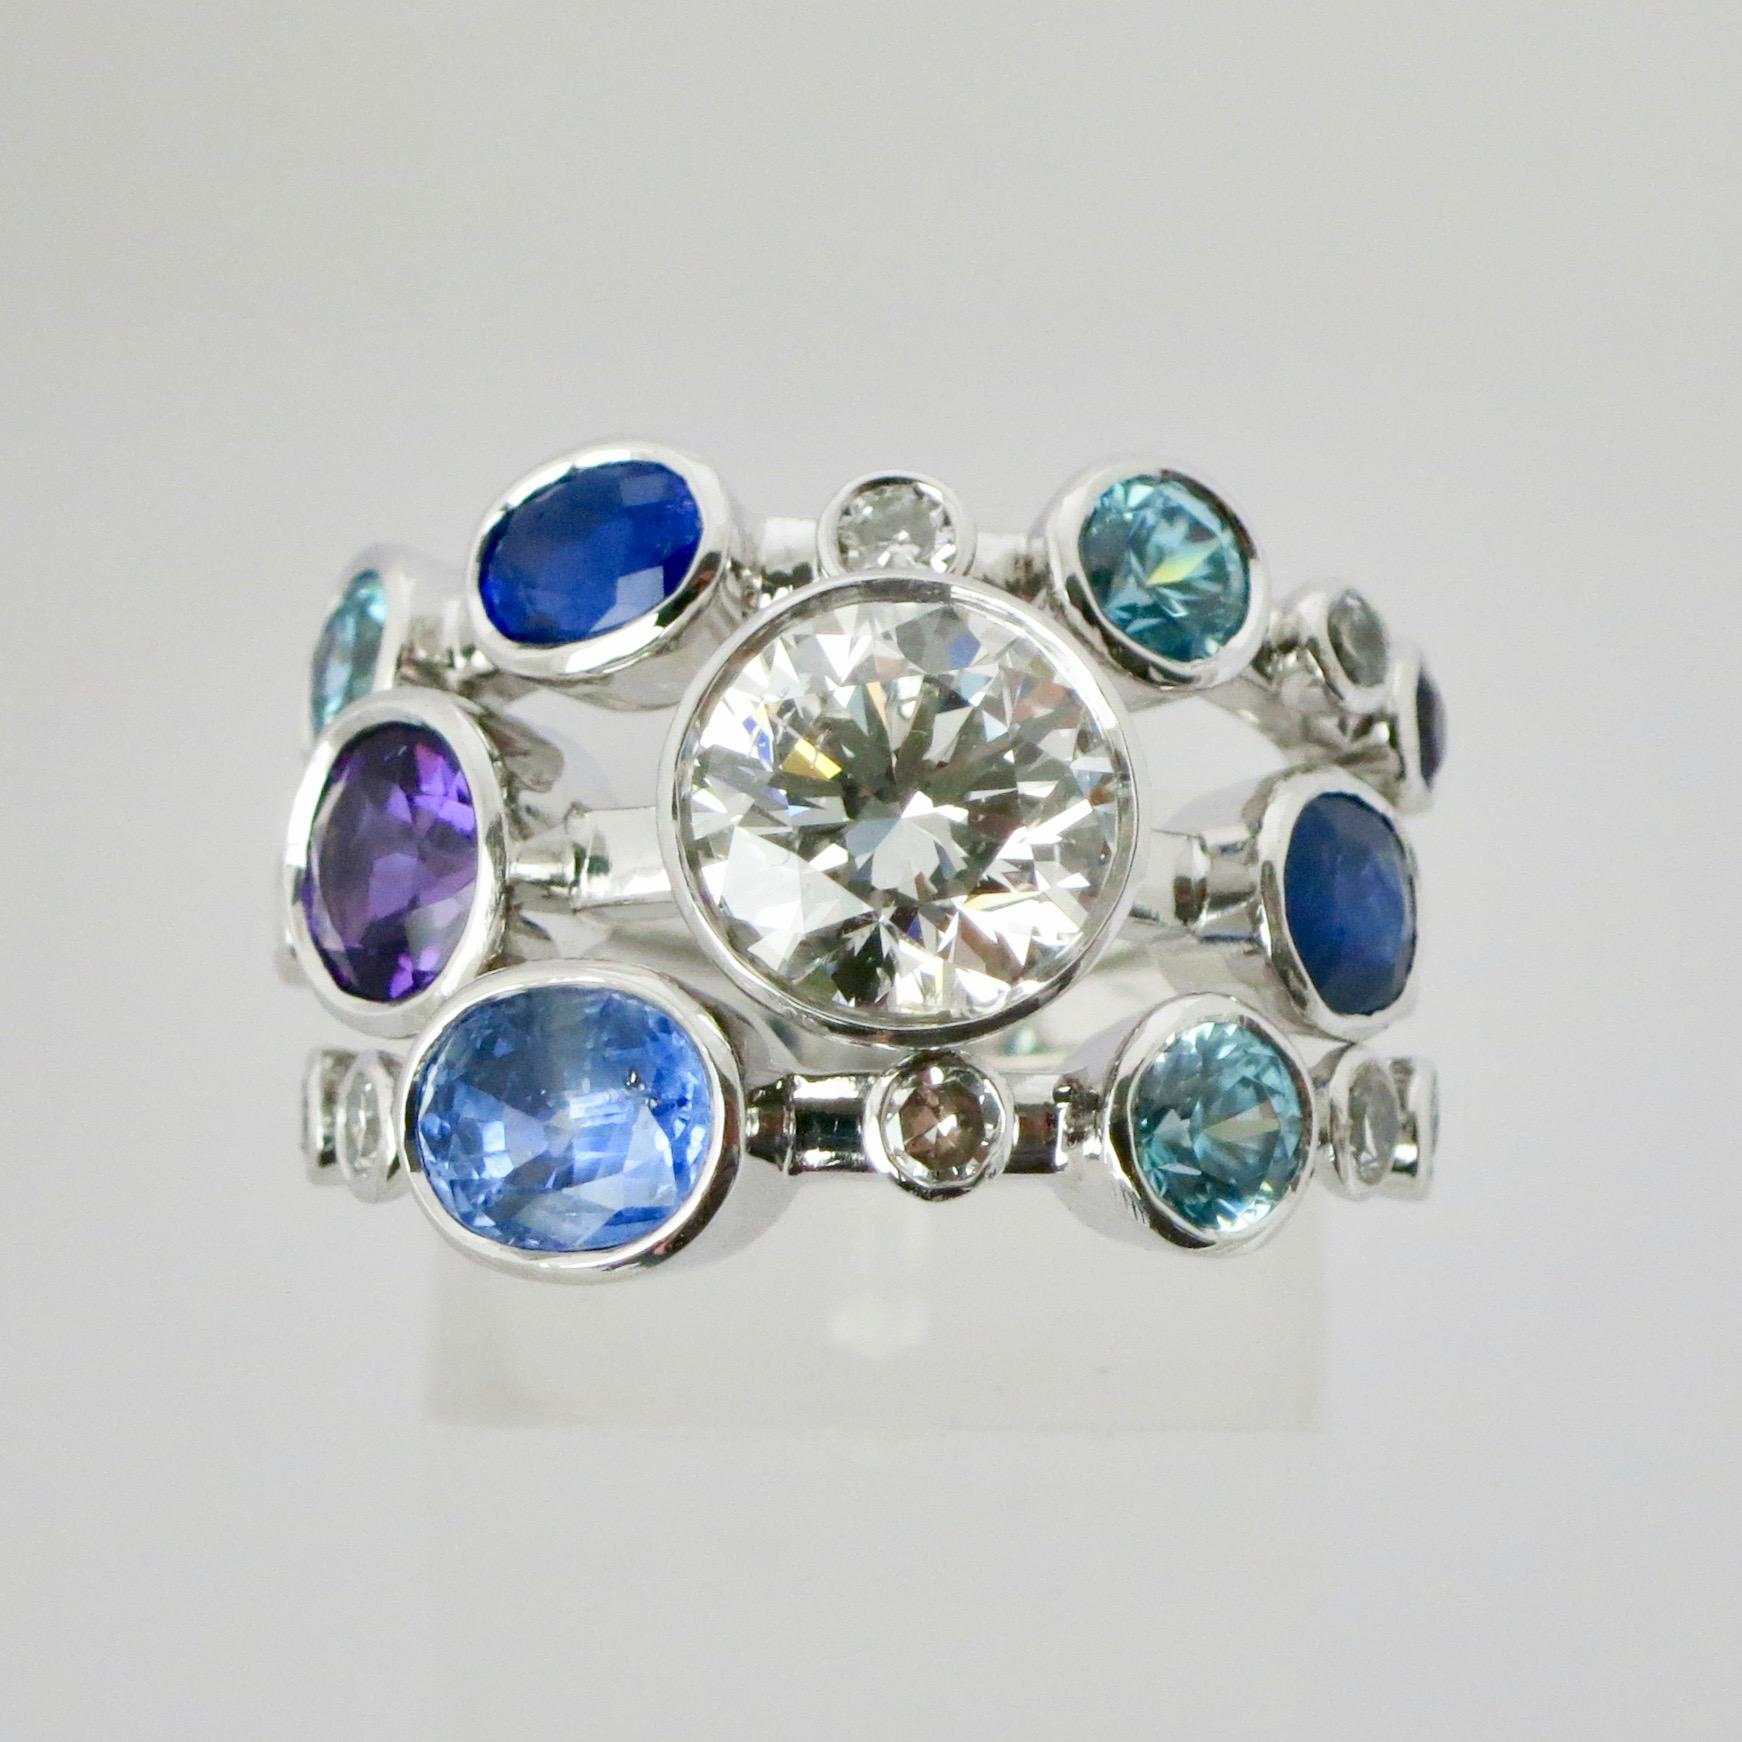 Triple mix diamond, sapphire & amethyst ring.jpeg